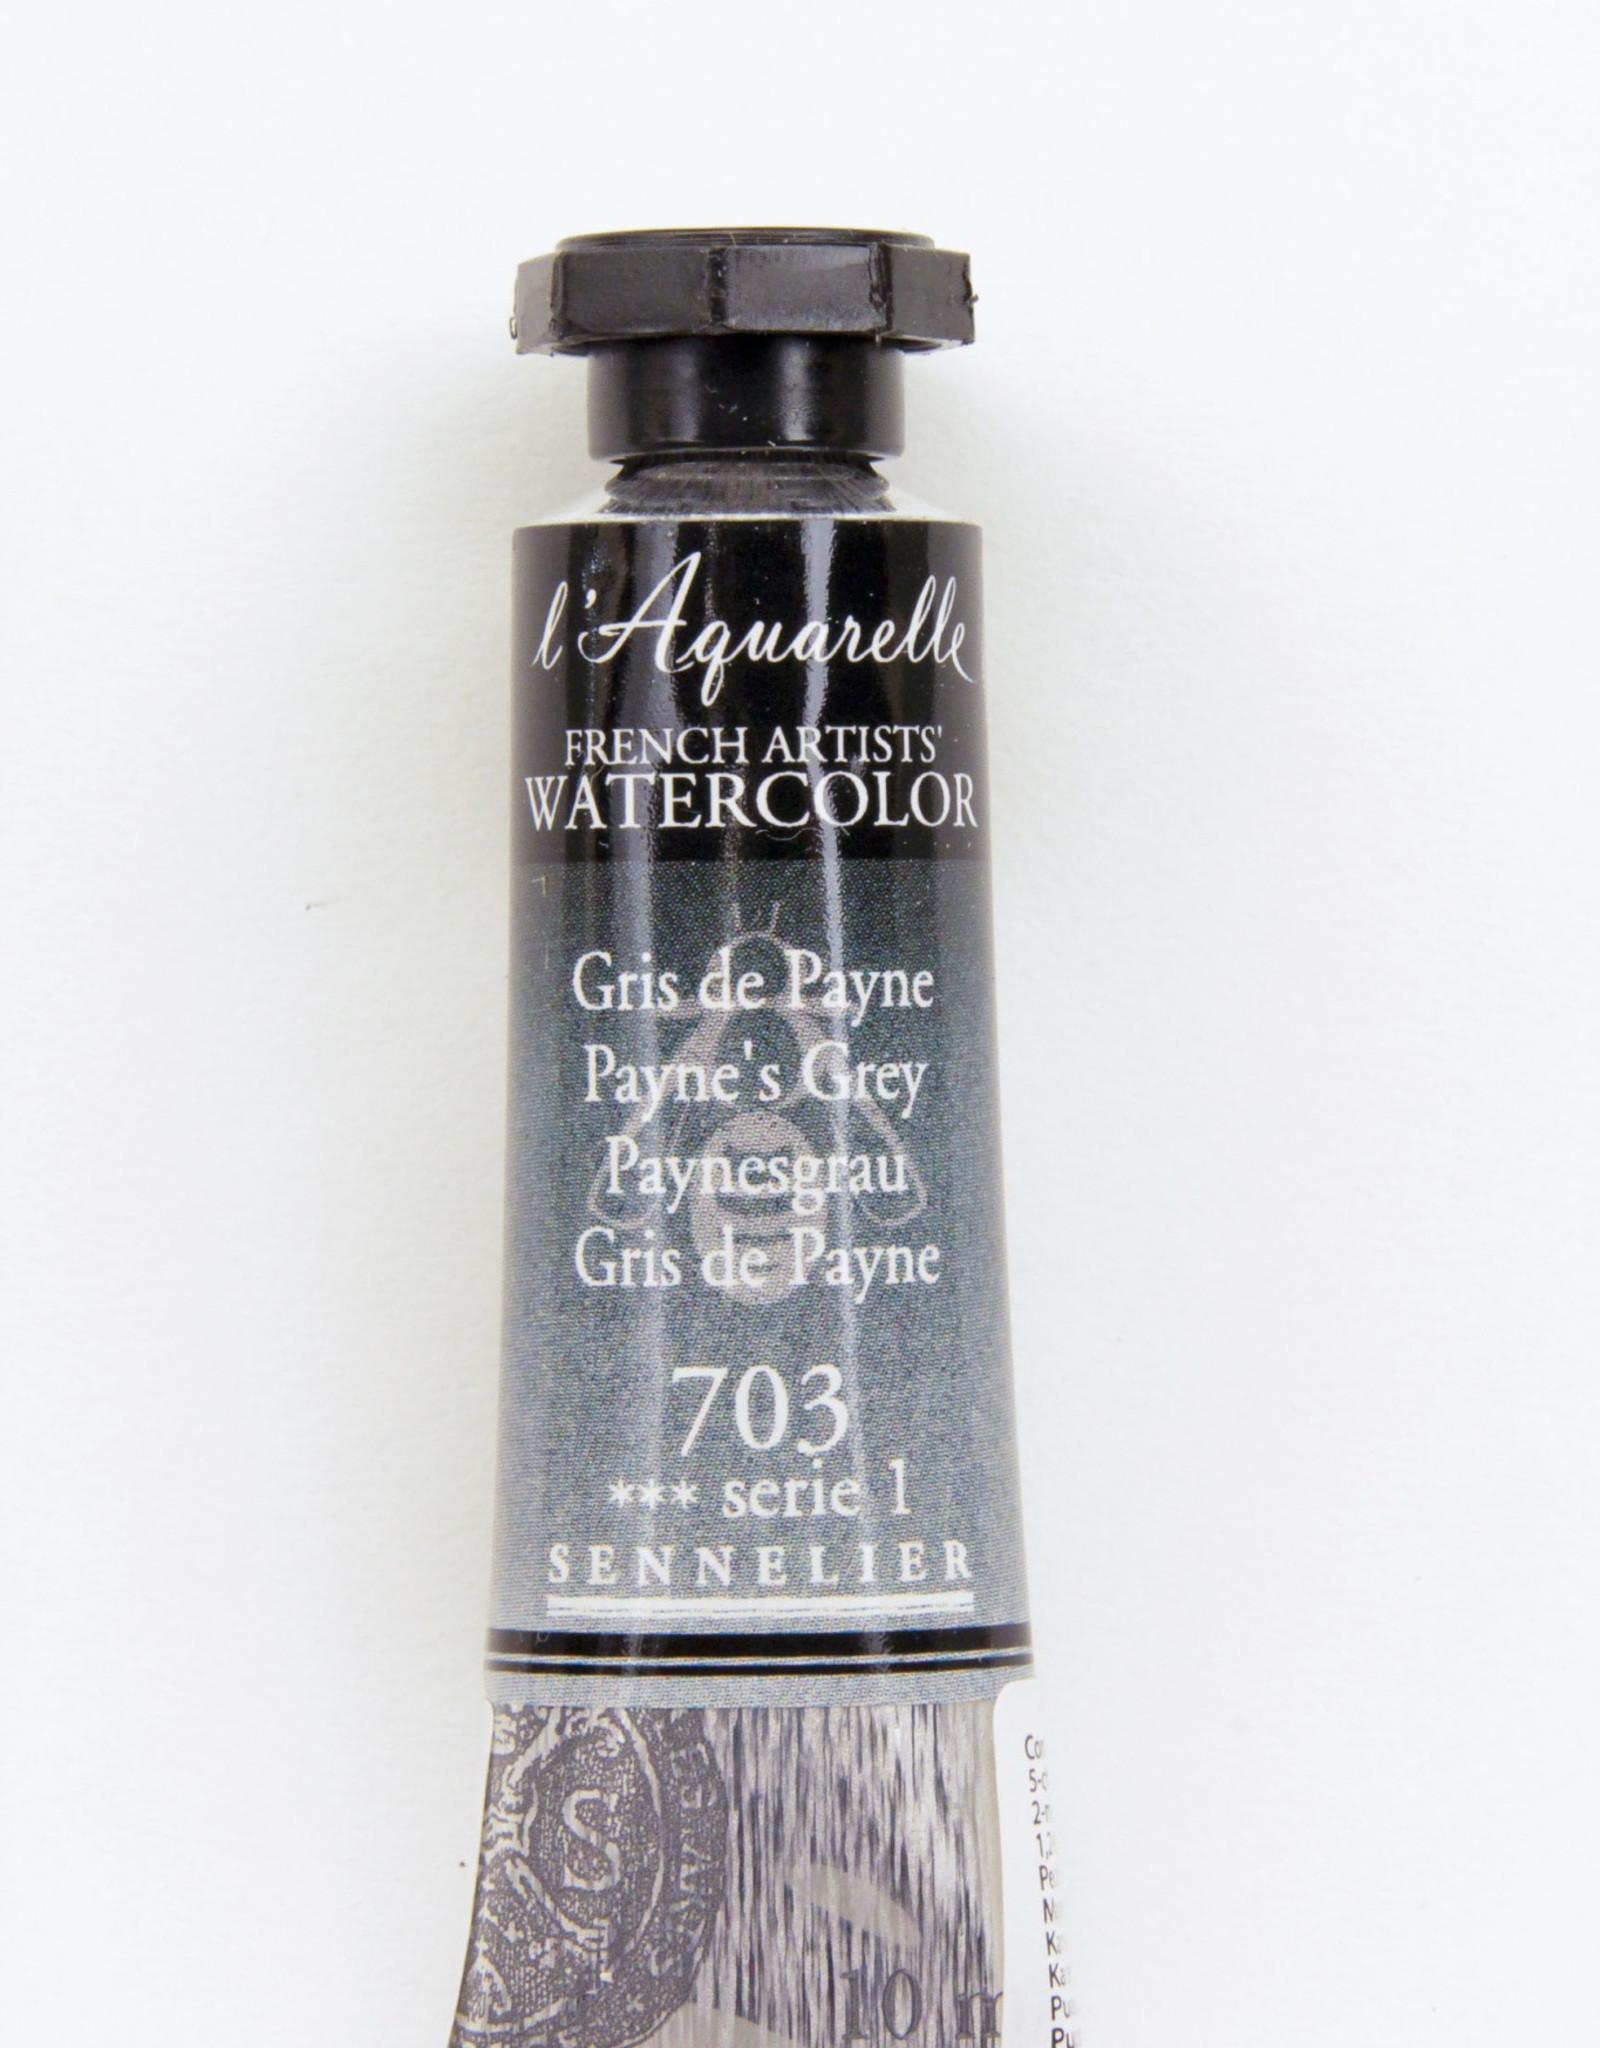 Sennelier, Aquarelle Watercolor Paint, Payne's Grey, 703,10ml Tube, Series 1